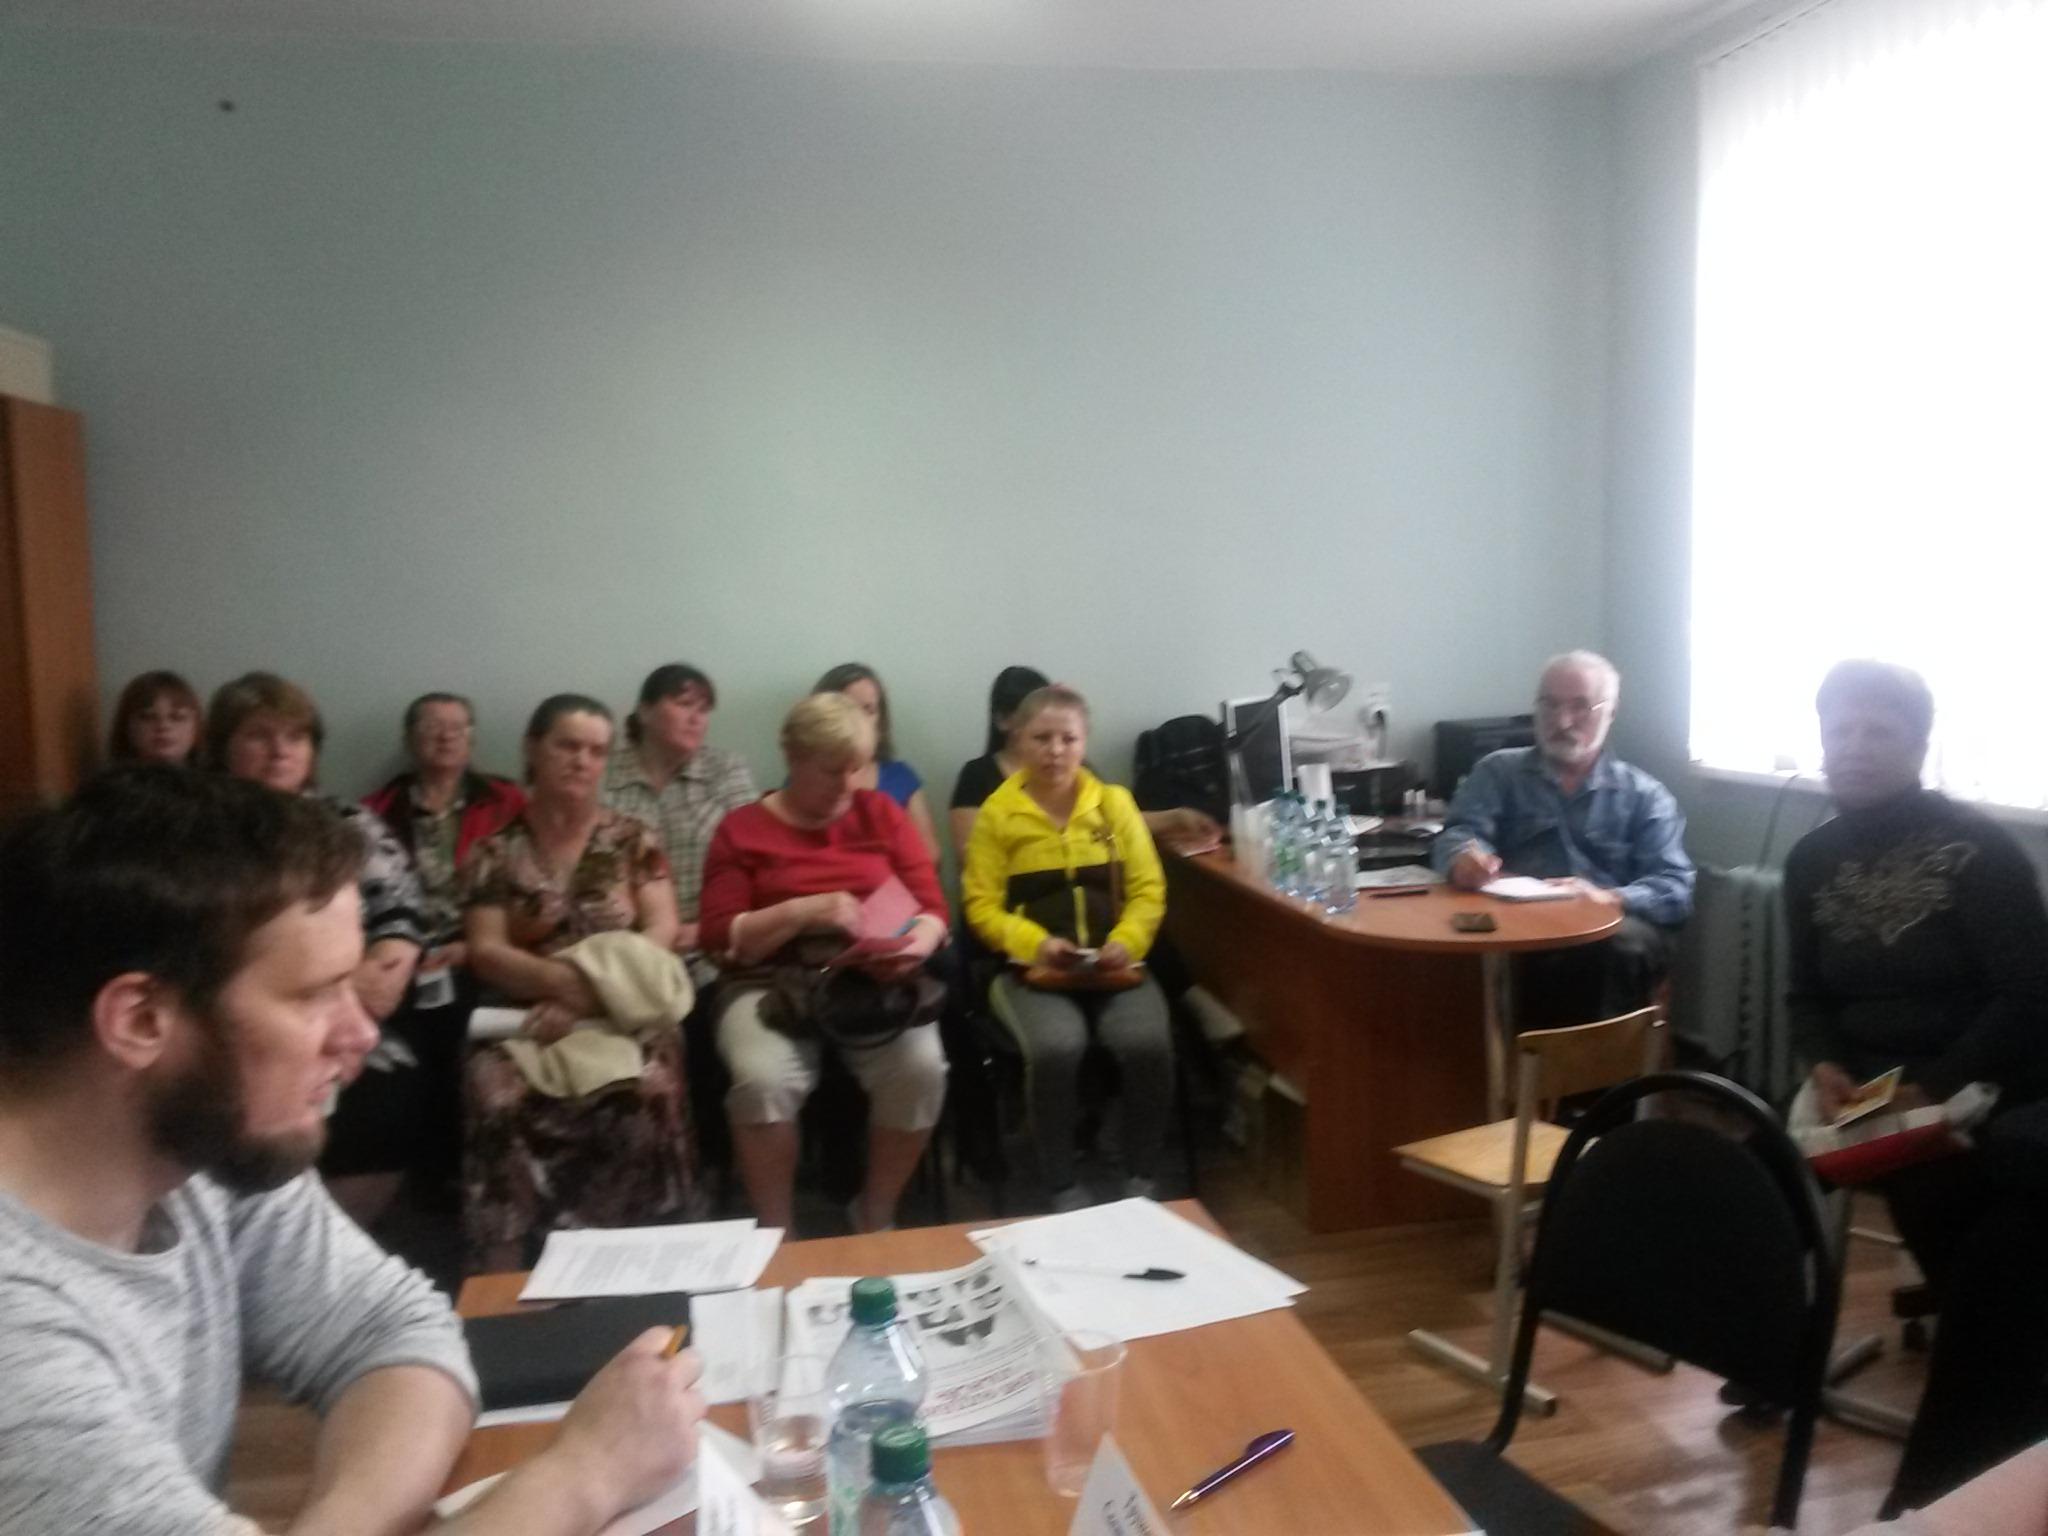 Консультация юриста по правам ребенка-инвалида консультации по защите прав потребителей Северцова улица